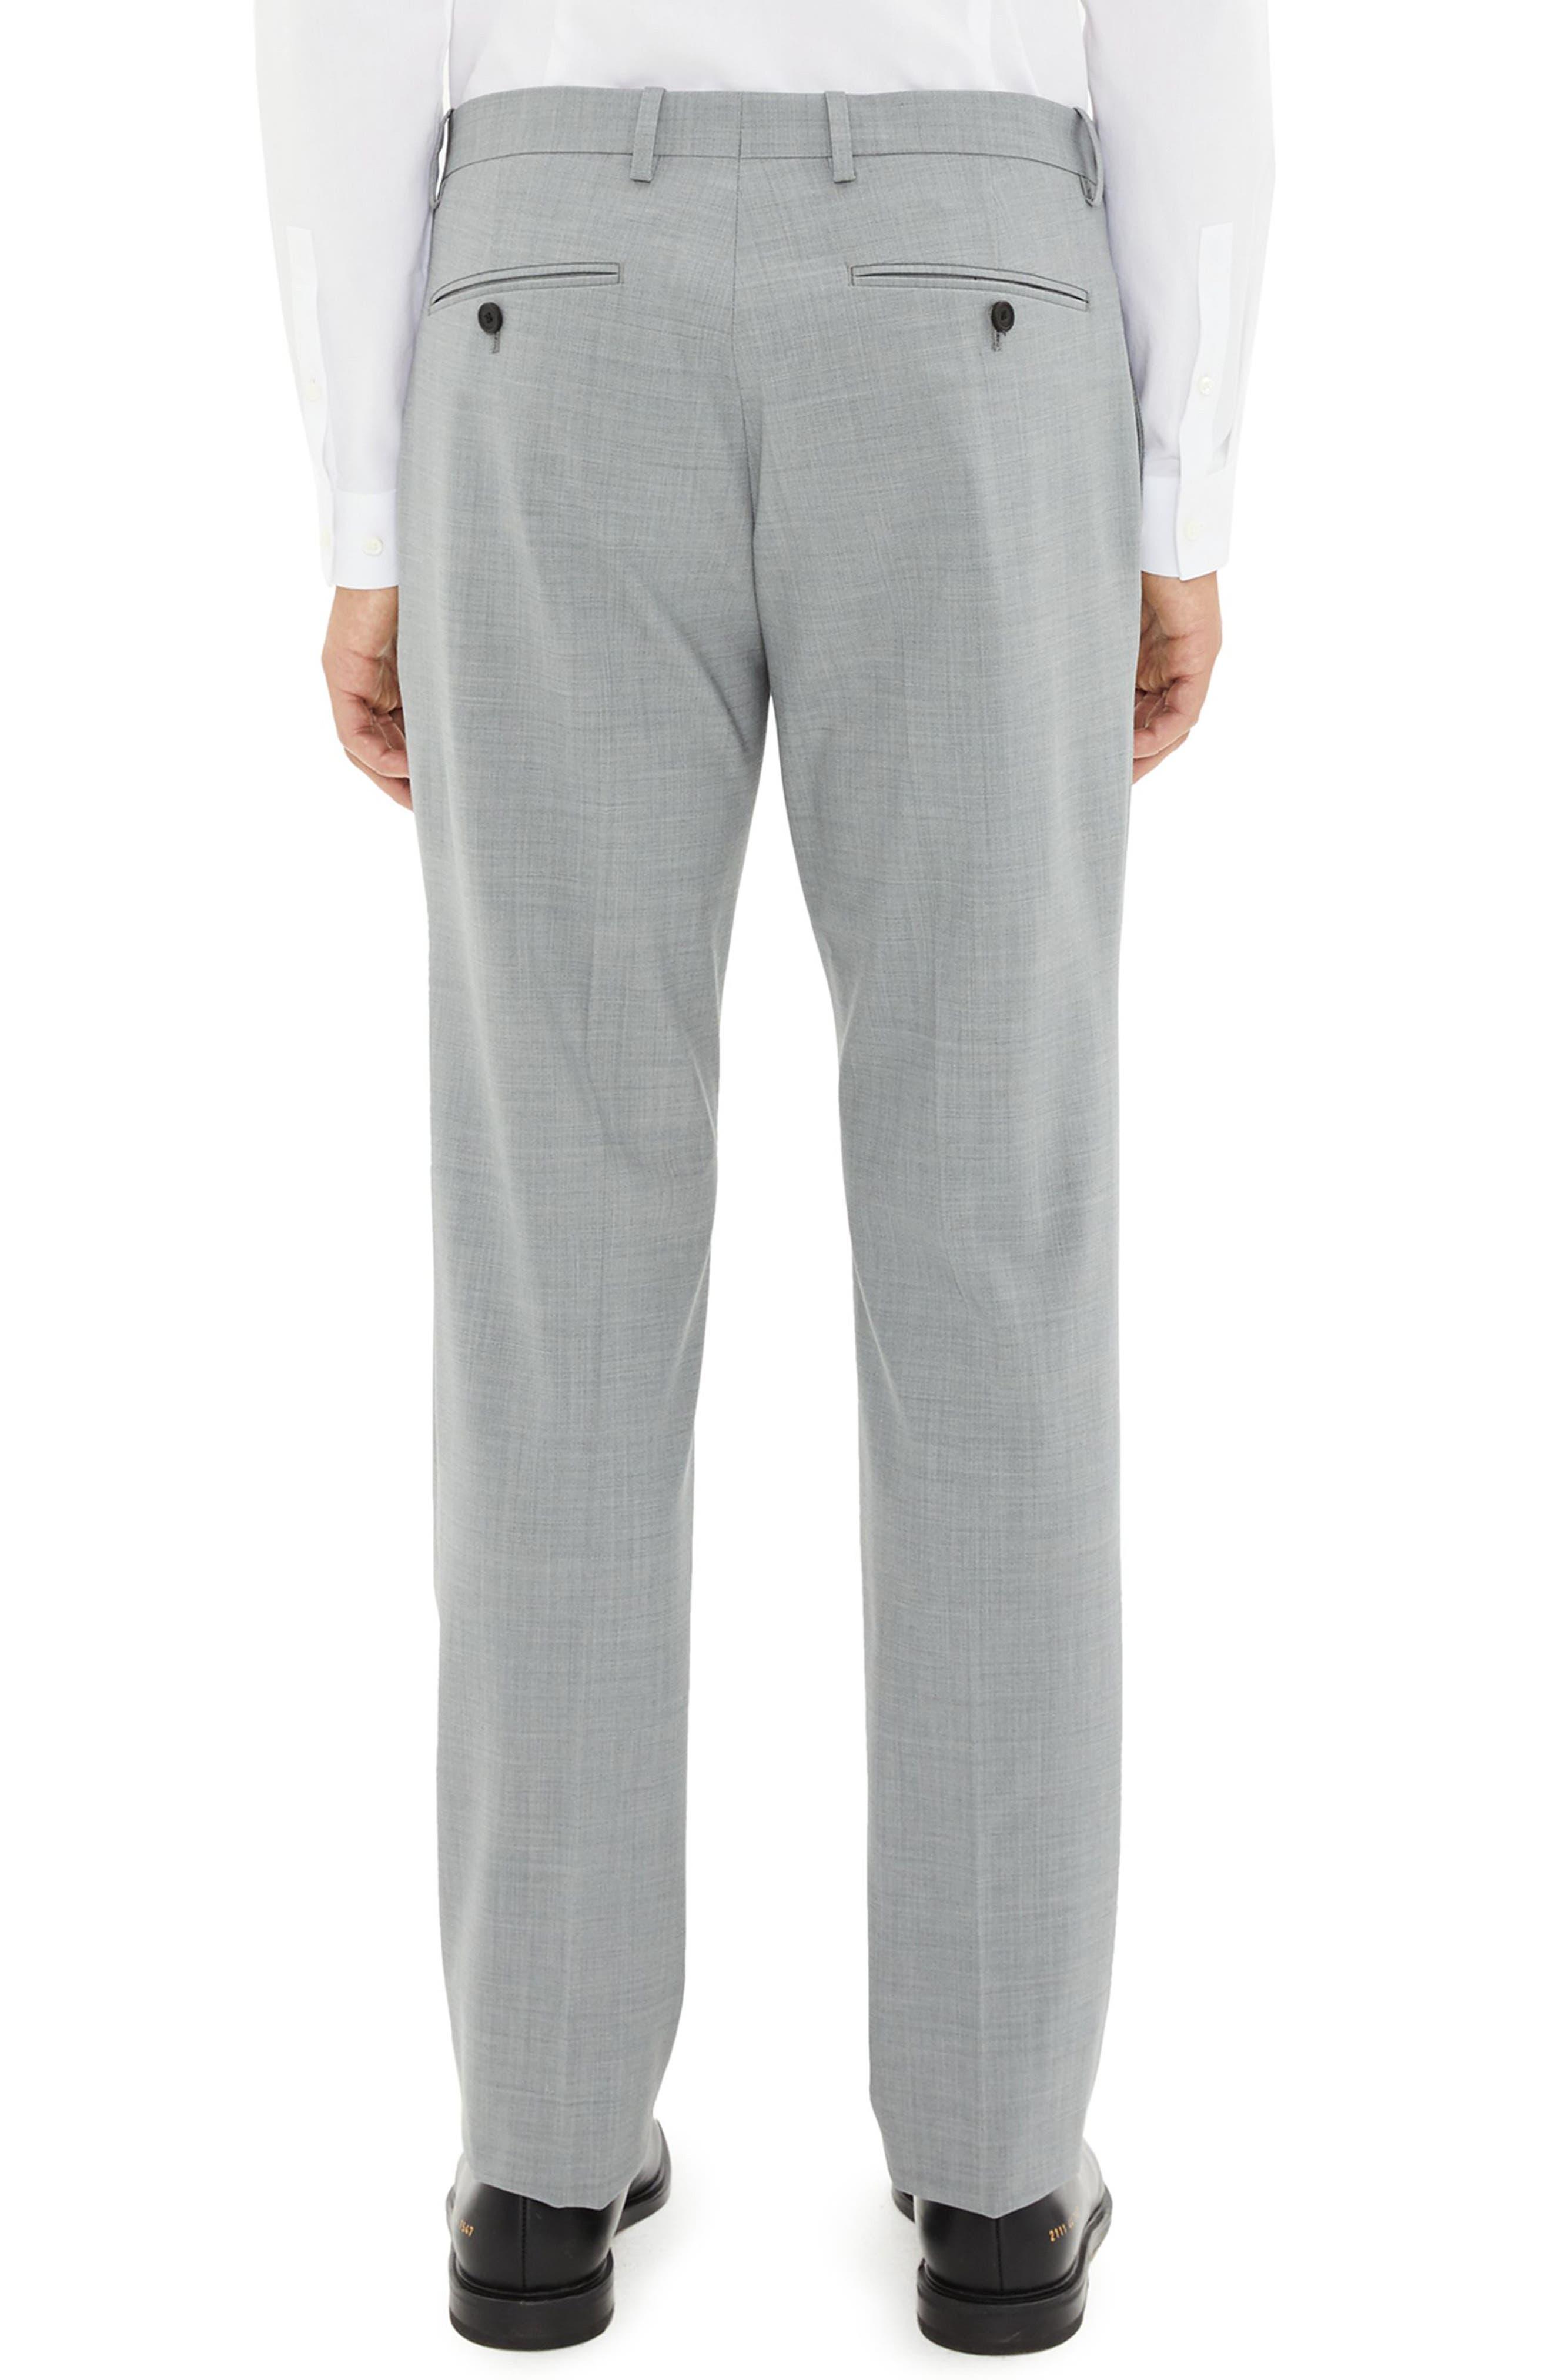 Mayer New Tailor 2 Wool Trousers,                             Alternate thumbnail 2, color,                             CHROME MELANGE